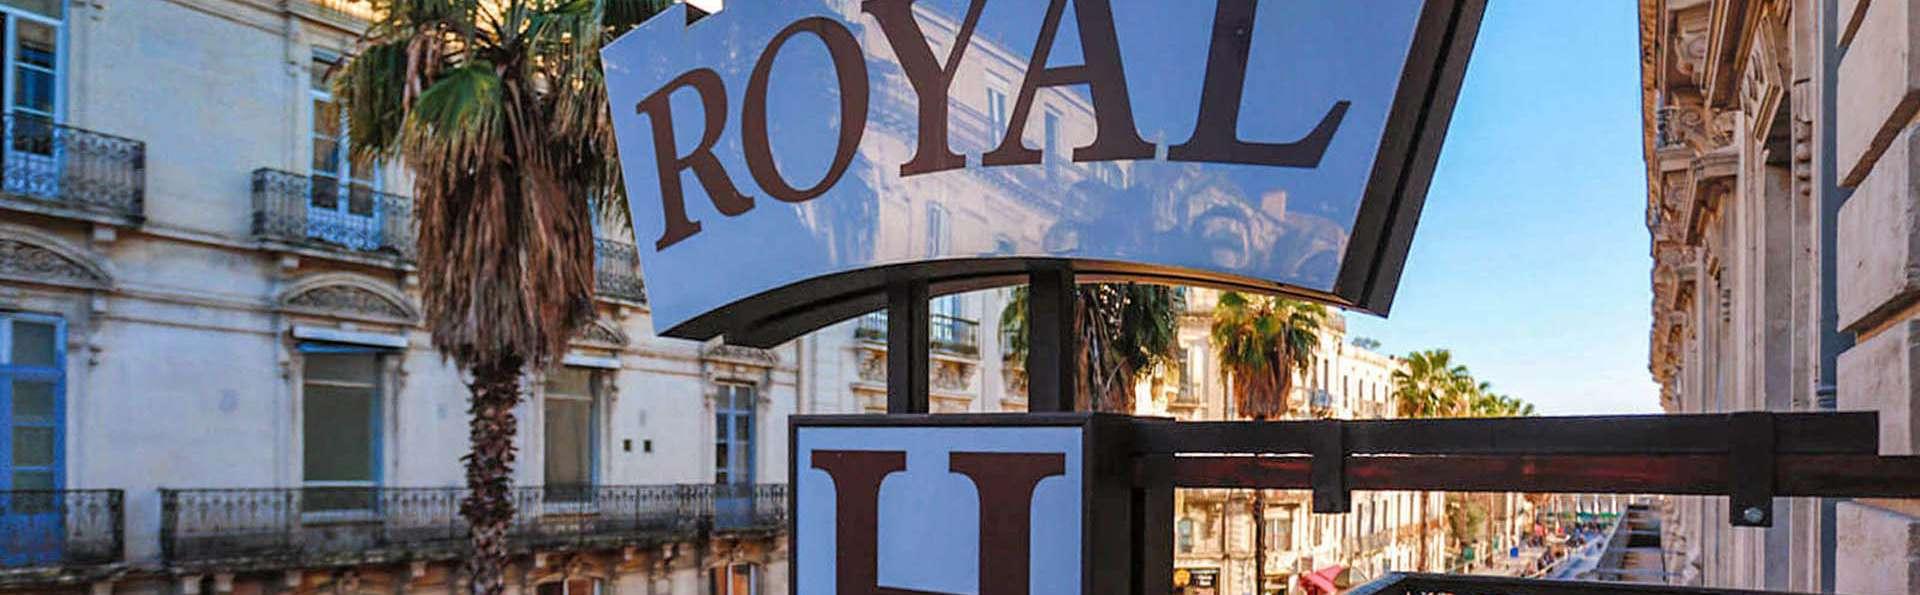 Royal Hôtel Roussillhotel - EDIT_Galeries_01.jpg